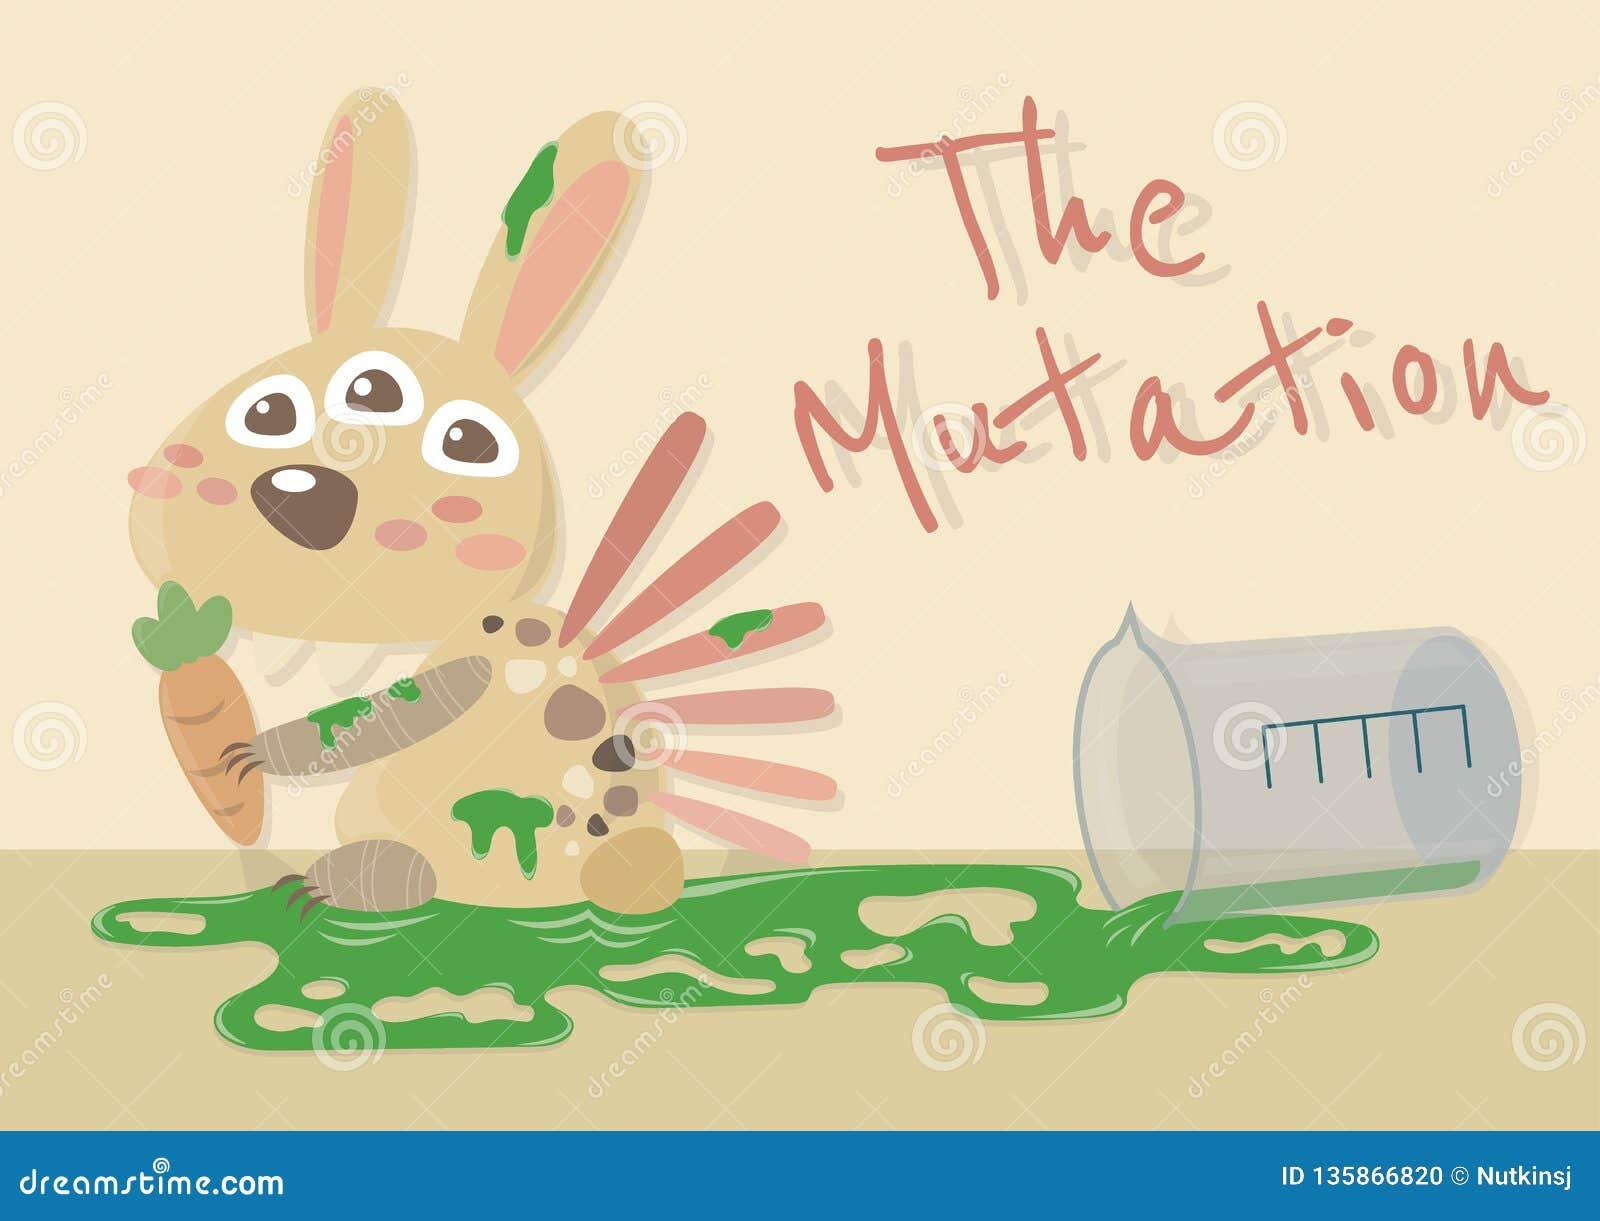 The Mutation Bunny